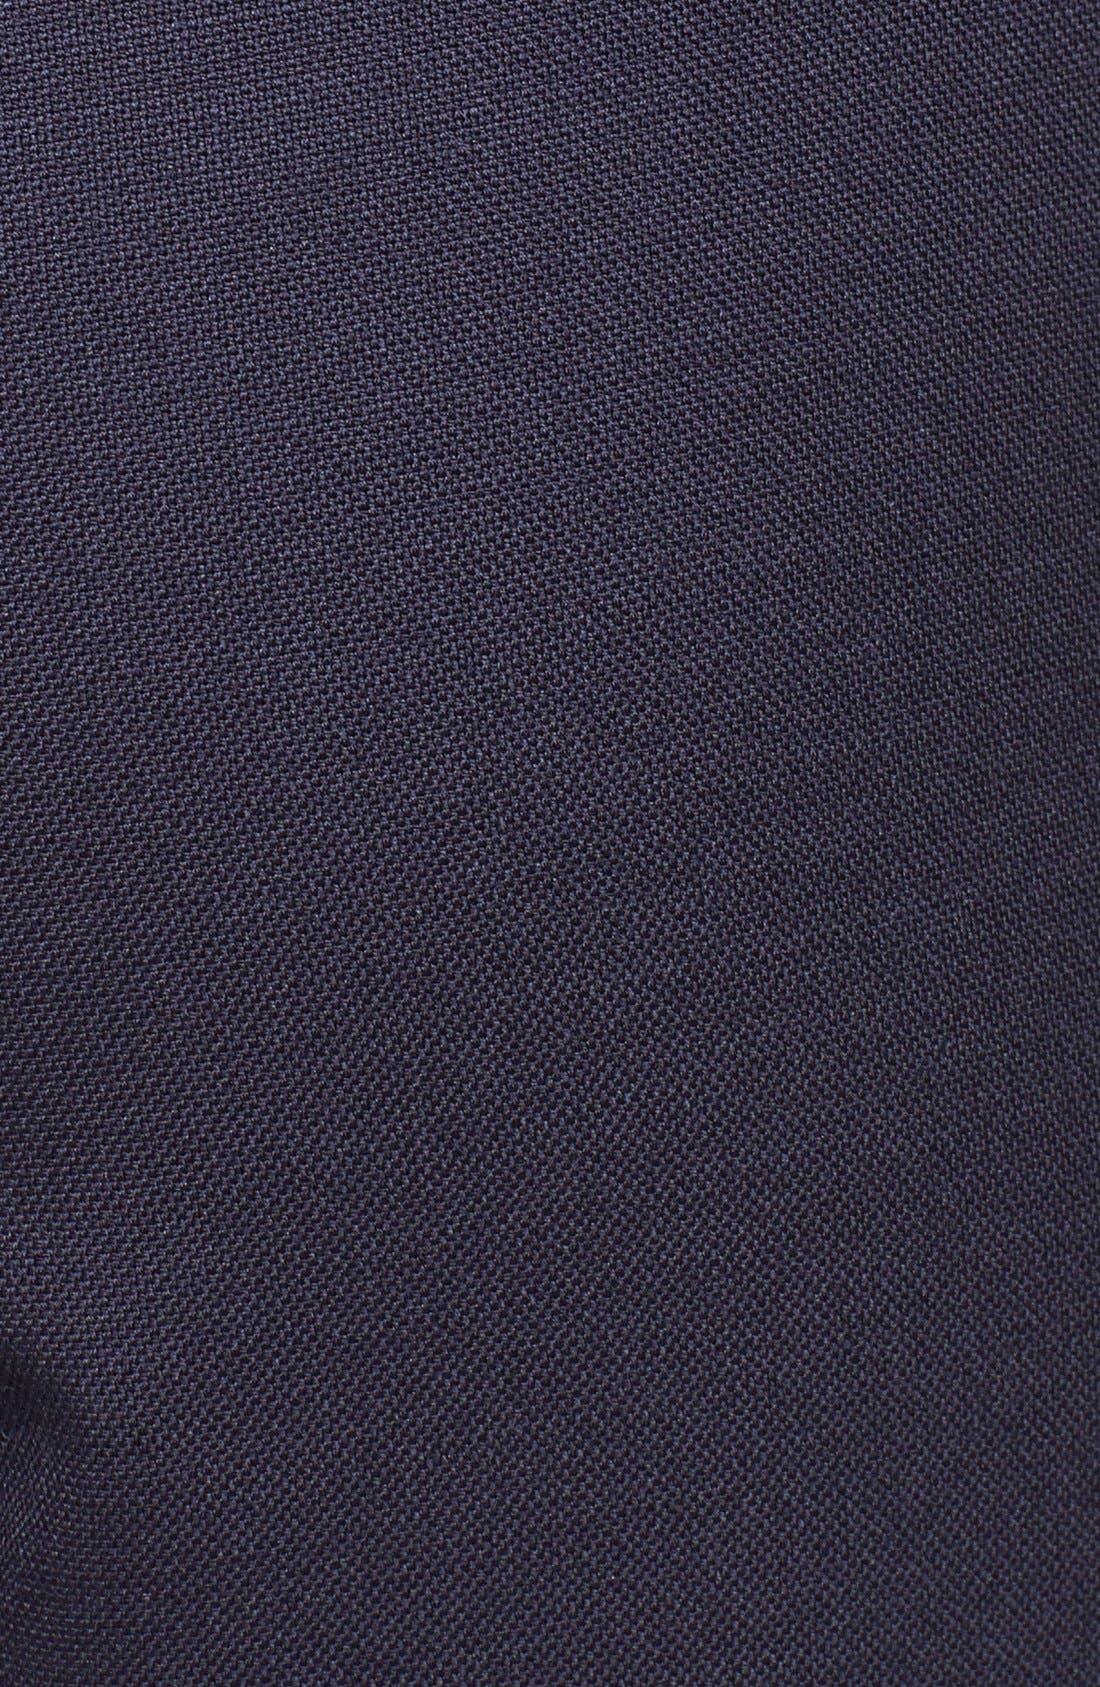 Alternate Image 3  - Tory Burch 'Fern' Stretch Wool Wide Leg Crop Pants